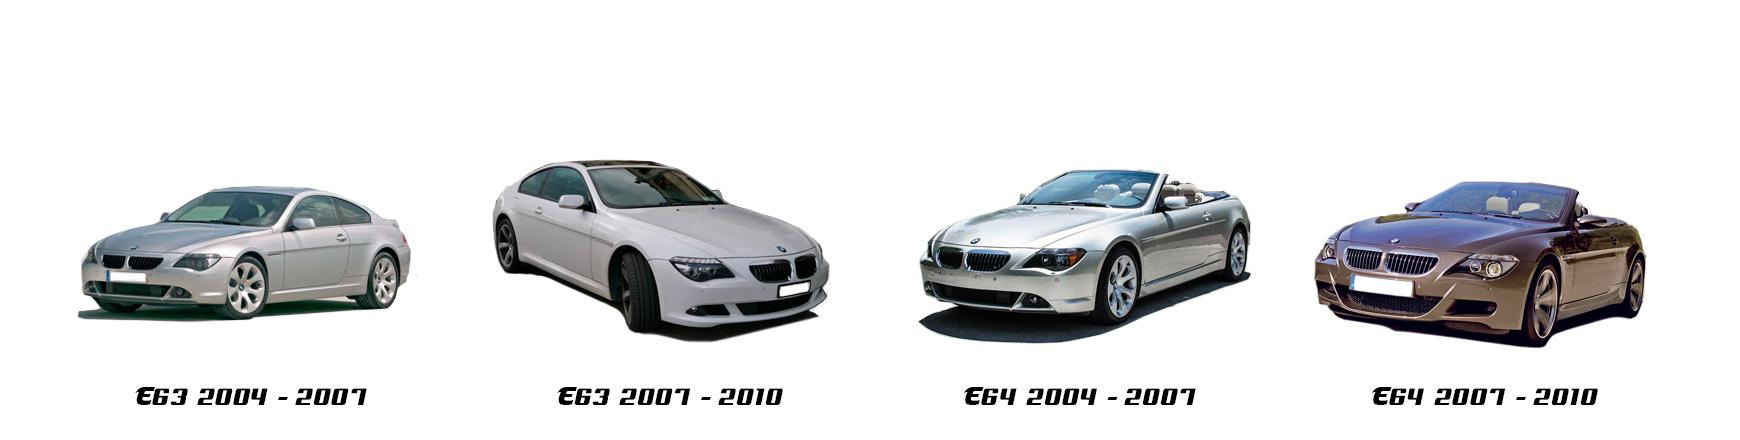 bmw serie 6 e63 e64 2004 2005 2006 2007 2008 2009 2010